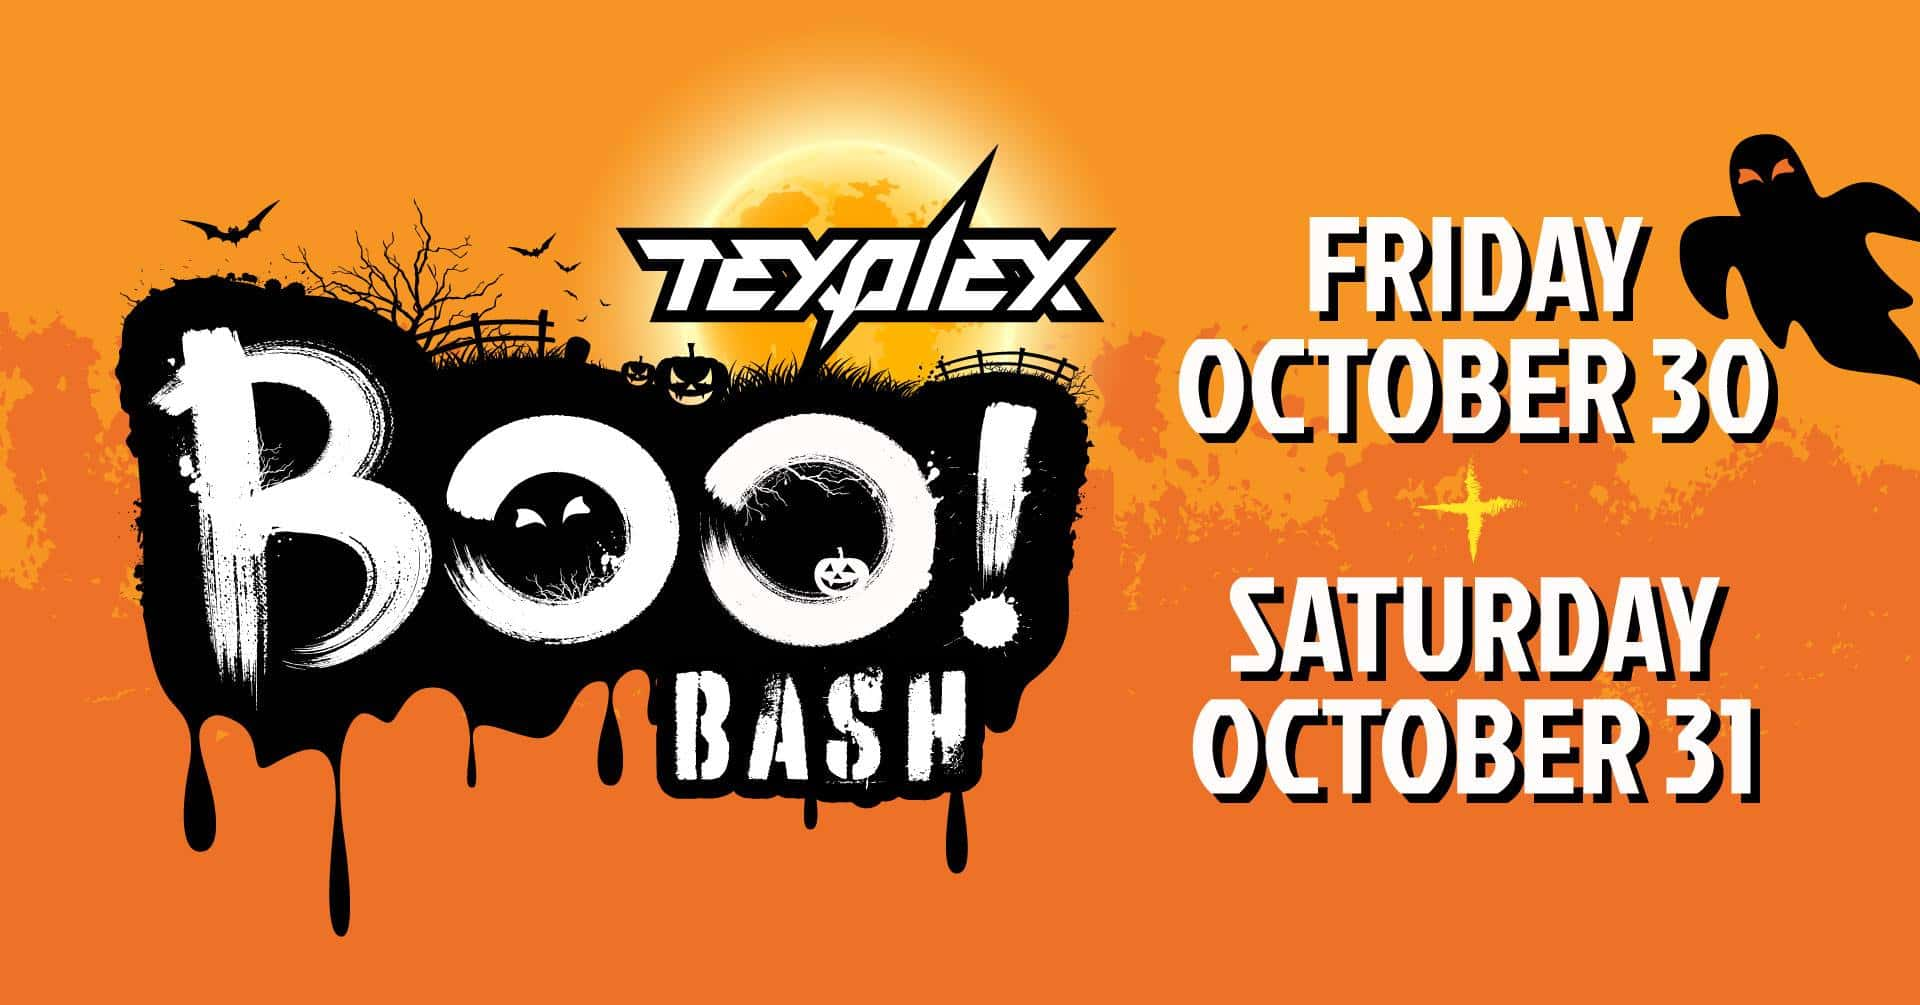 TexPlex Boo Bash flyer